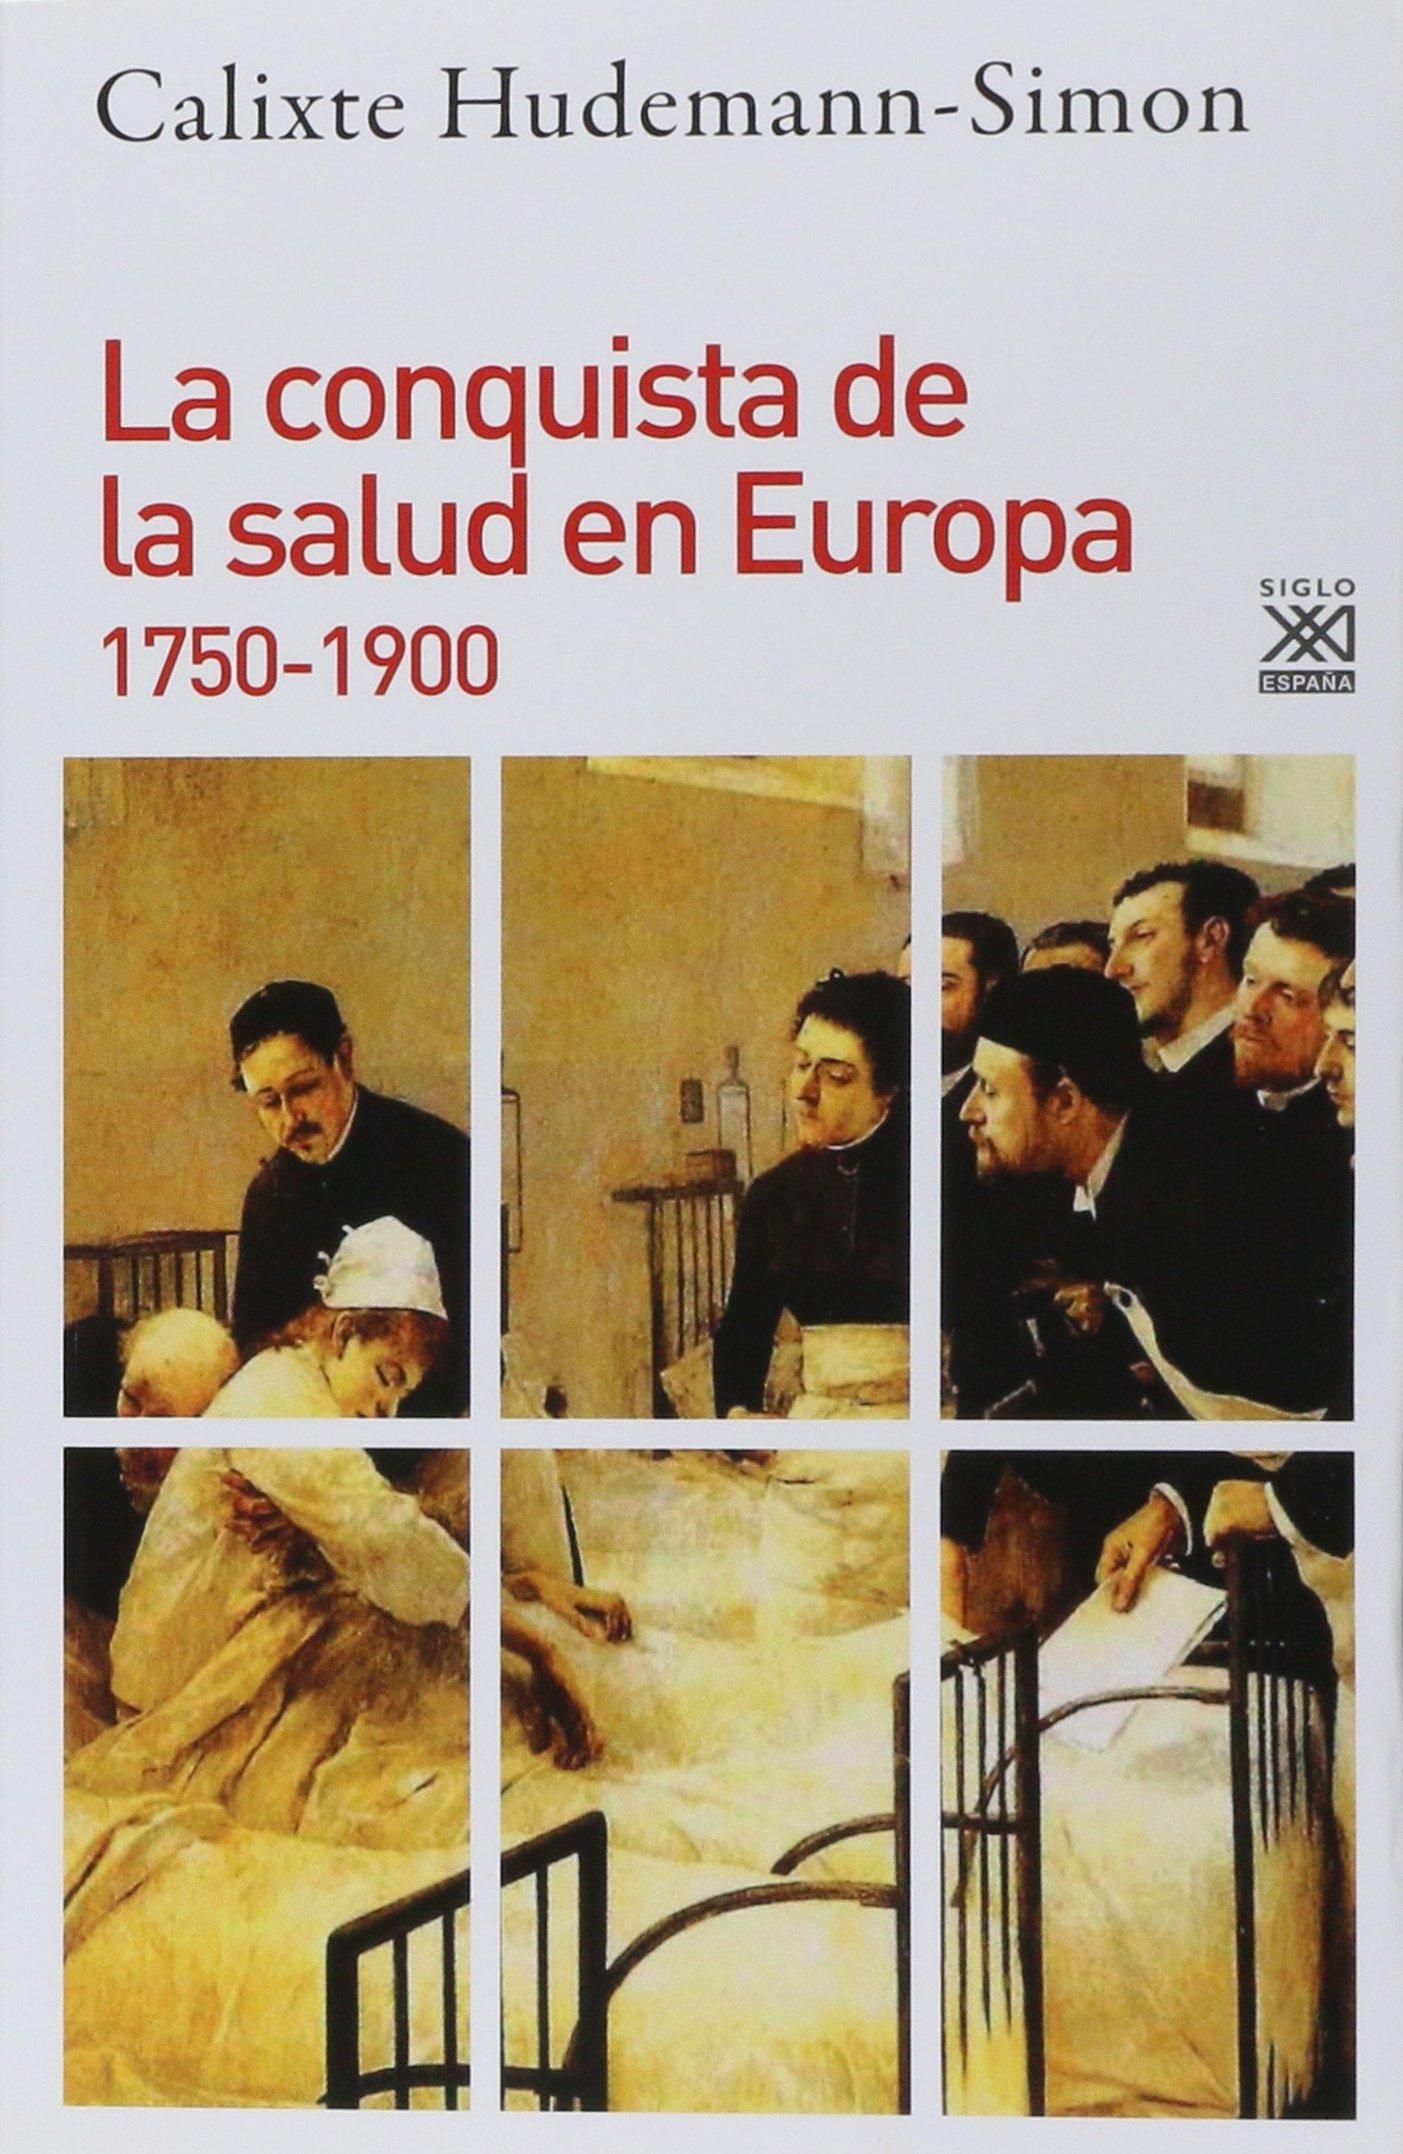 La conquista de la salud en Europa. 1750-1900: 1164 Siglo XXI de España General: Amazon.es: Hudemann-Simon, Calixte, Díaz Chorne, Juan Pablo: Libros